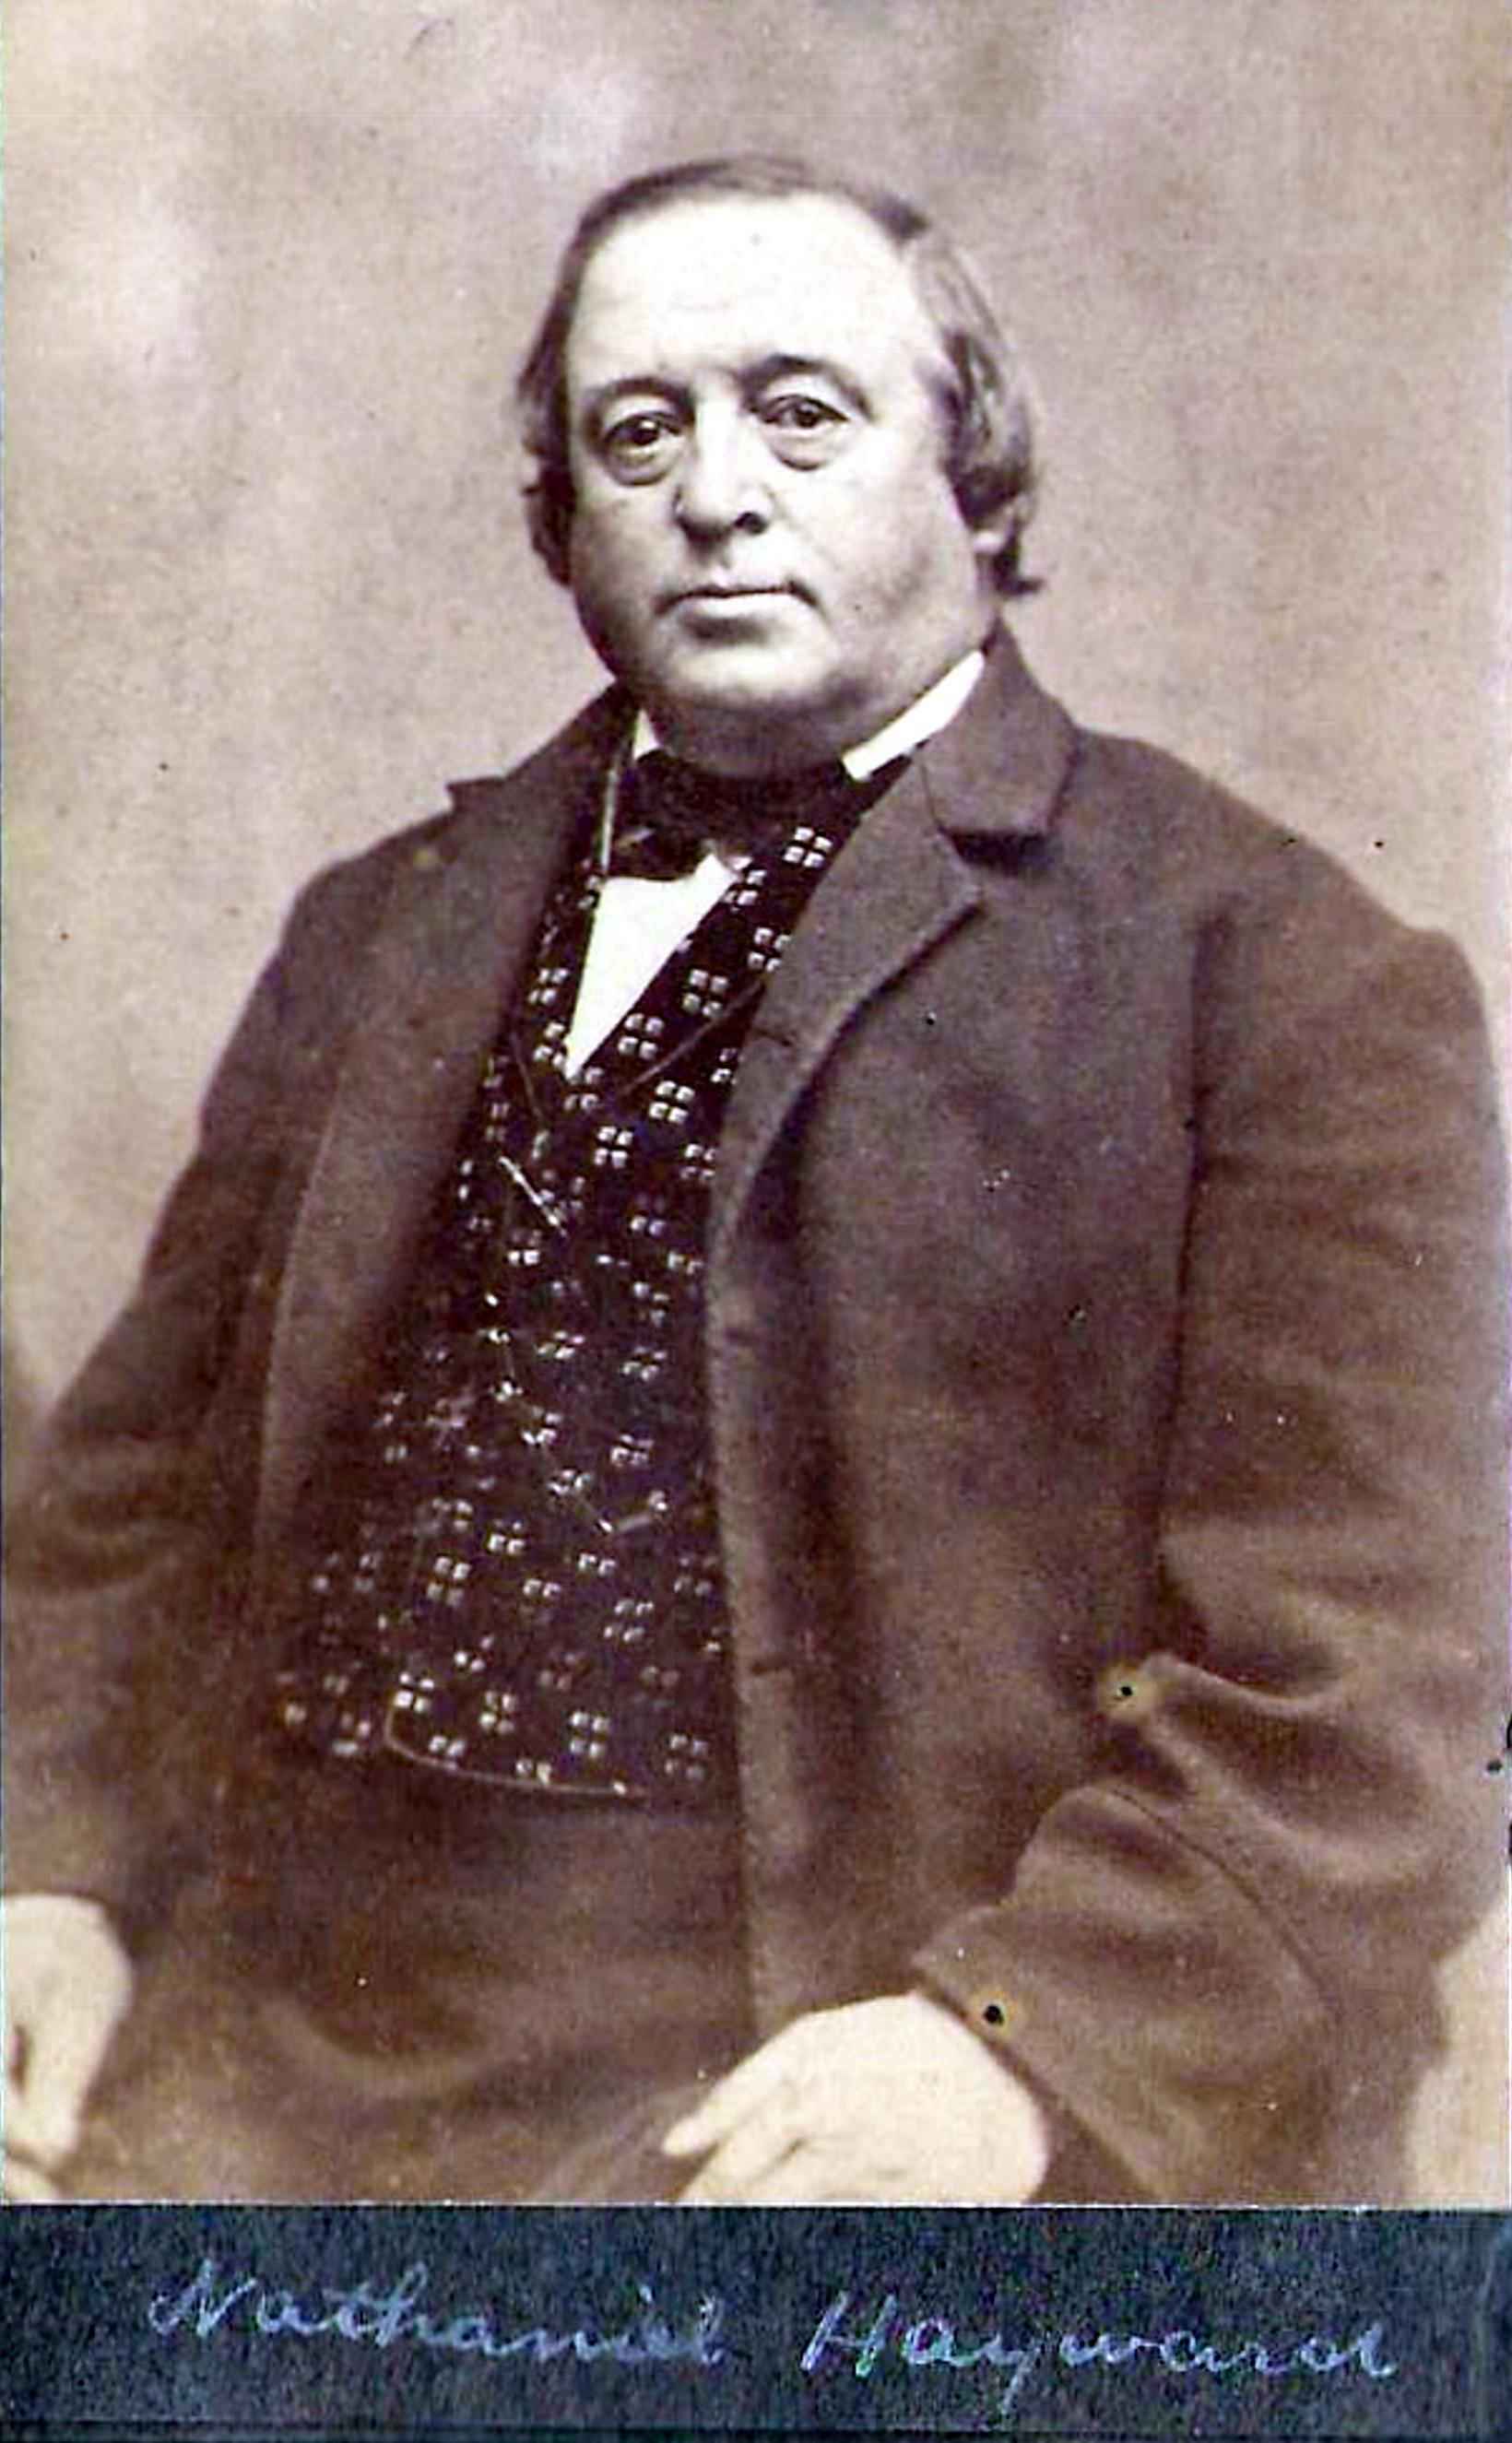 Nathaniel Manley Hayward